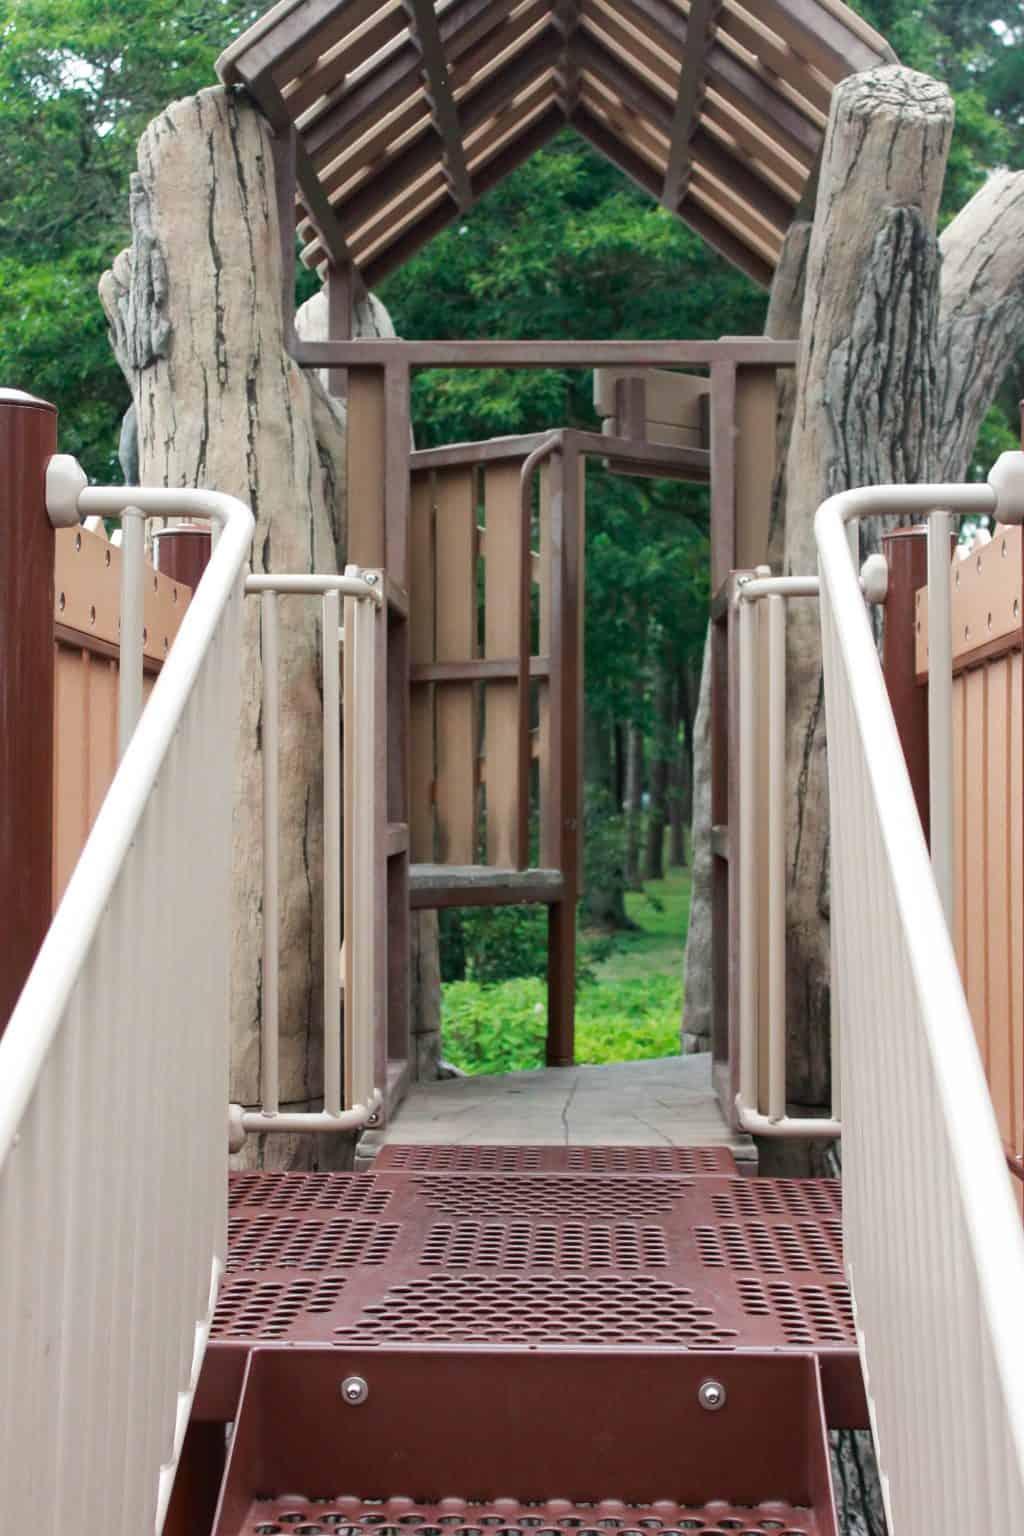 windward-beach-park-playground-brick-nj_27651422023_o-1024x1536